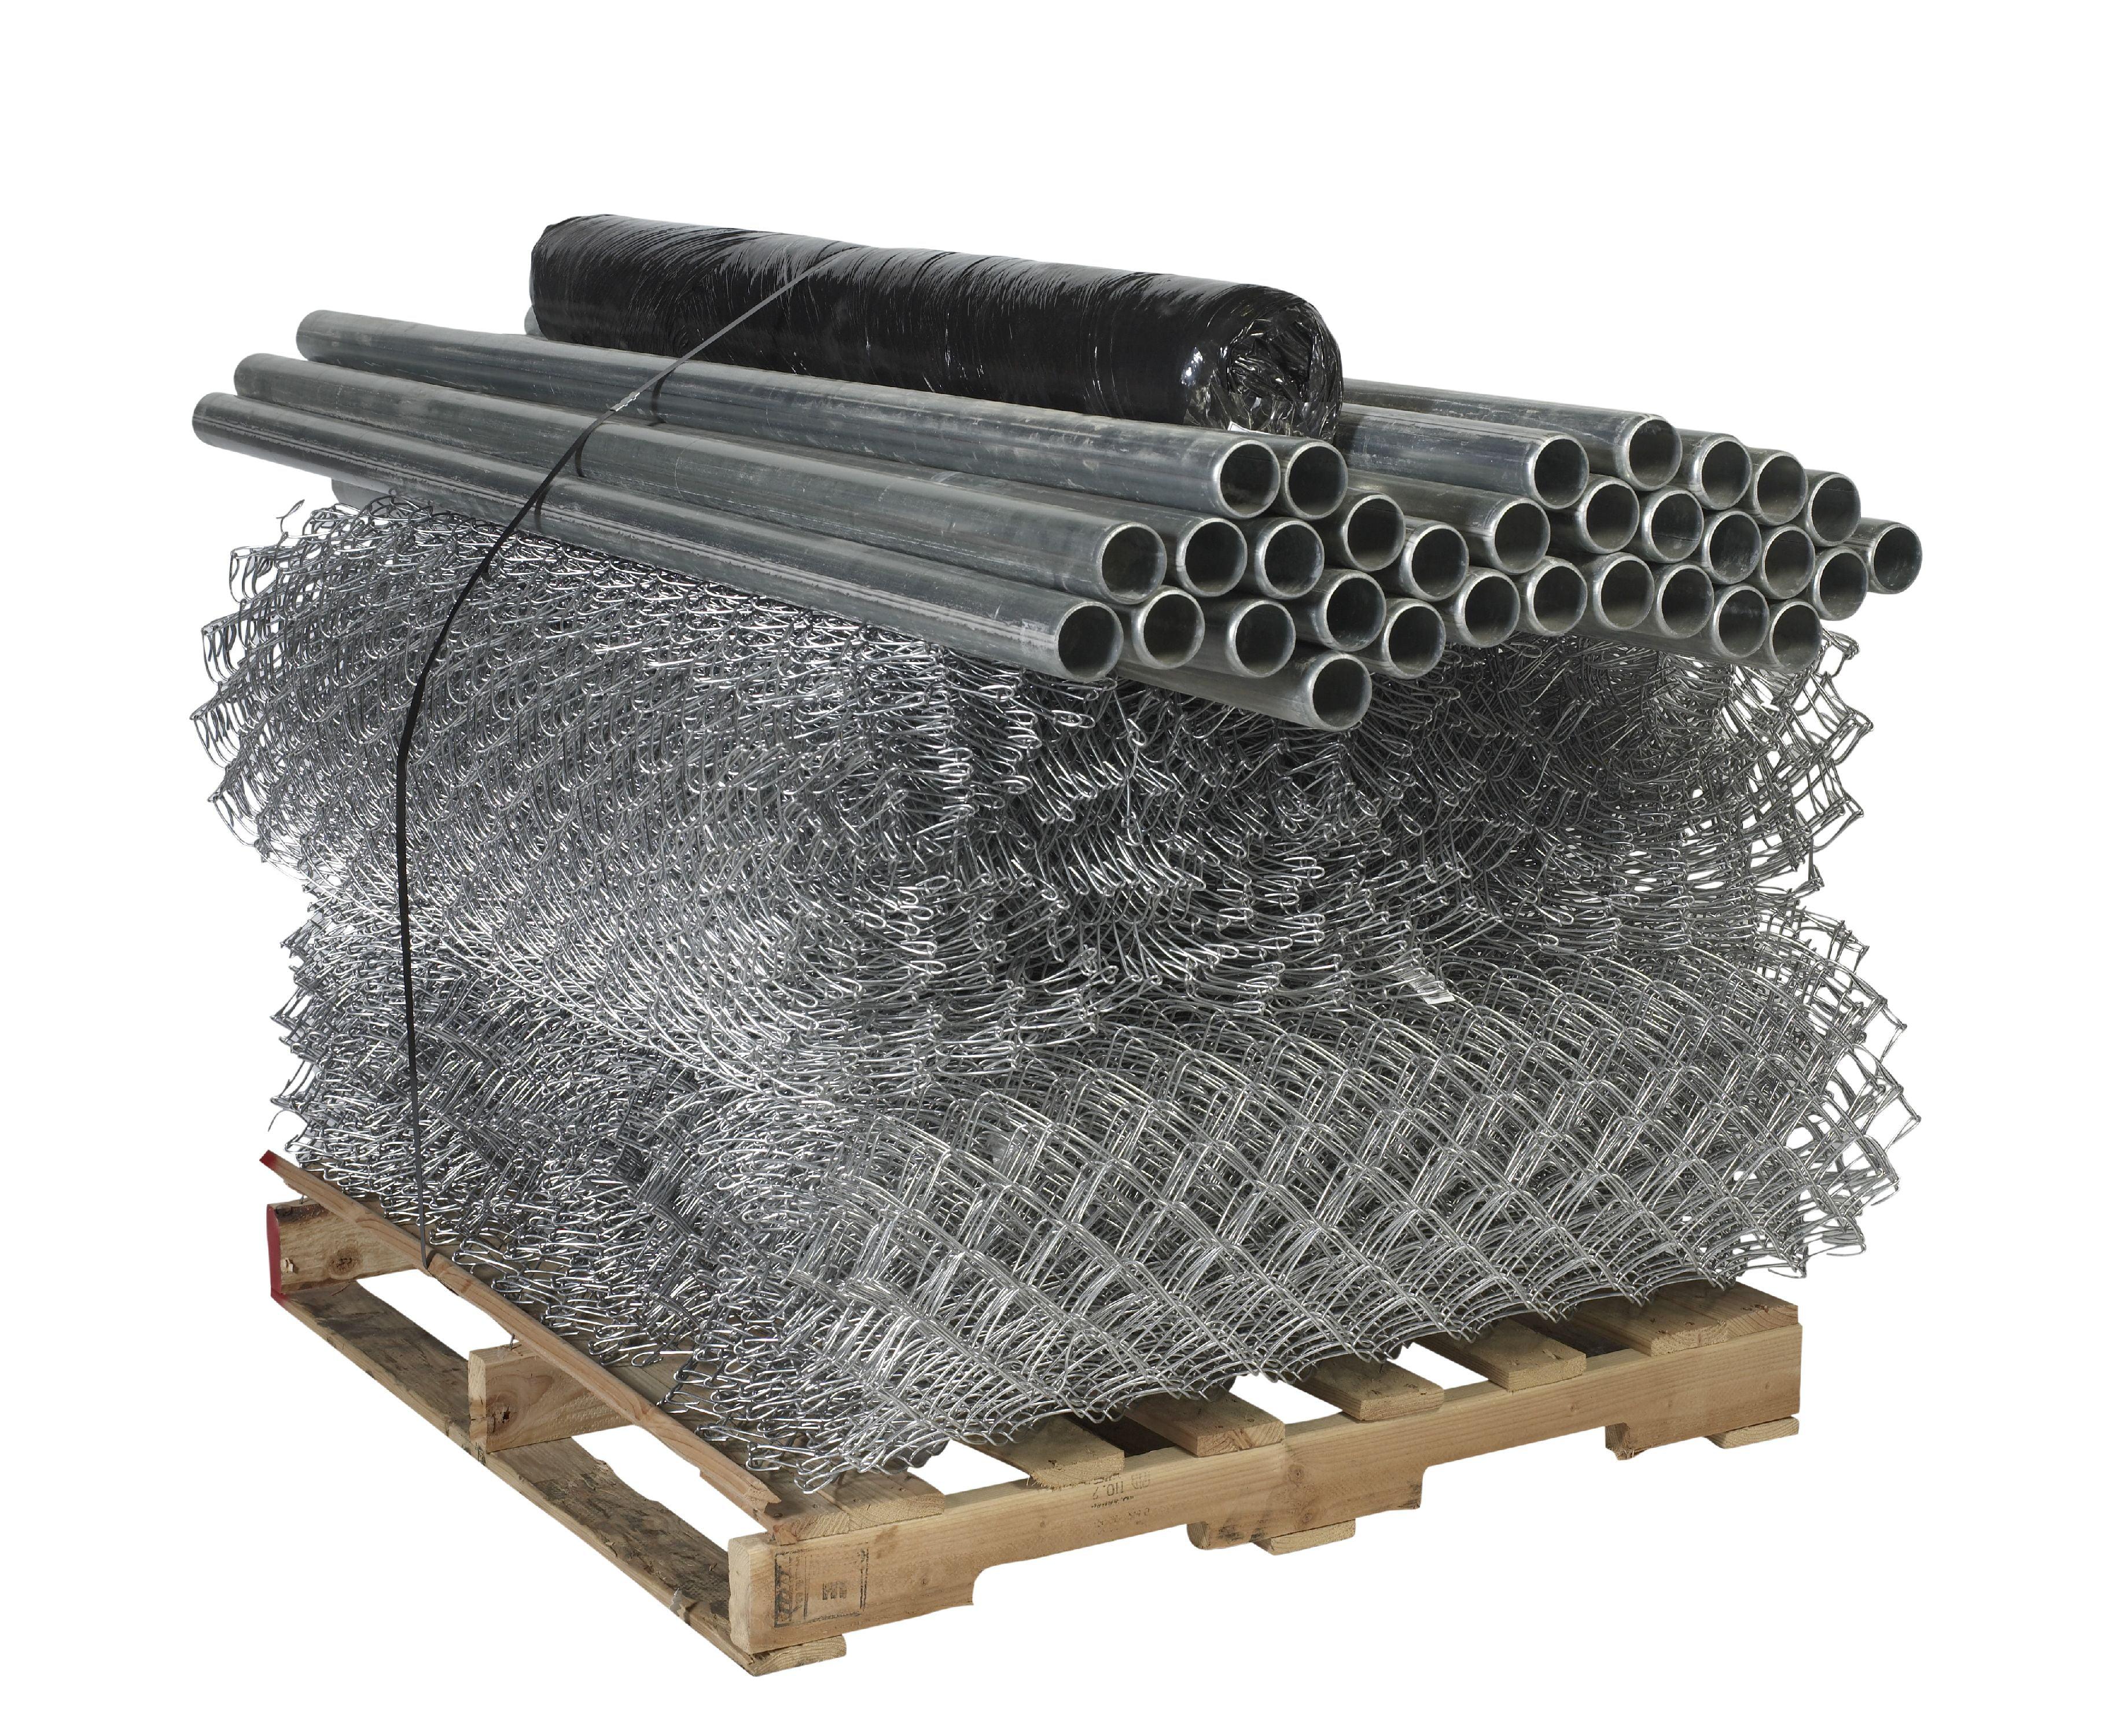 Super Silt Fence Kit, 300 ft by